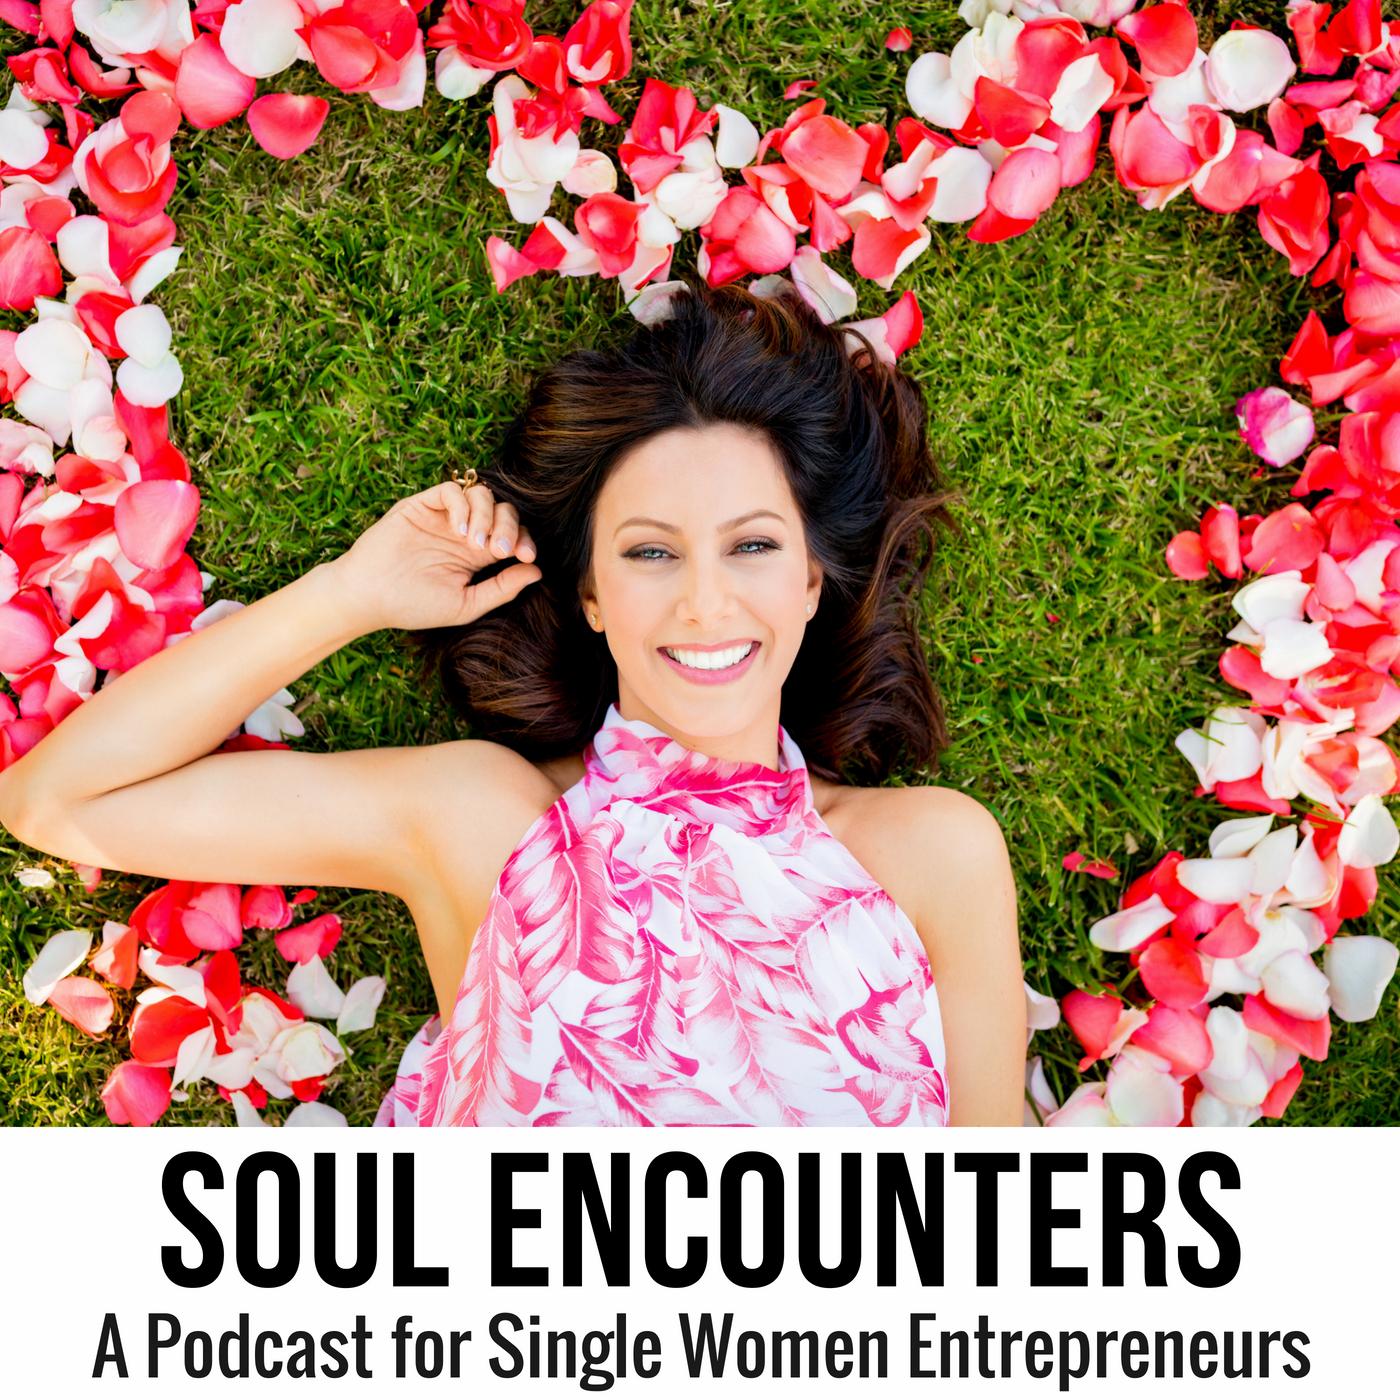 Soul Encounters - A Podcast for Single Women Entrepreneurs show art